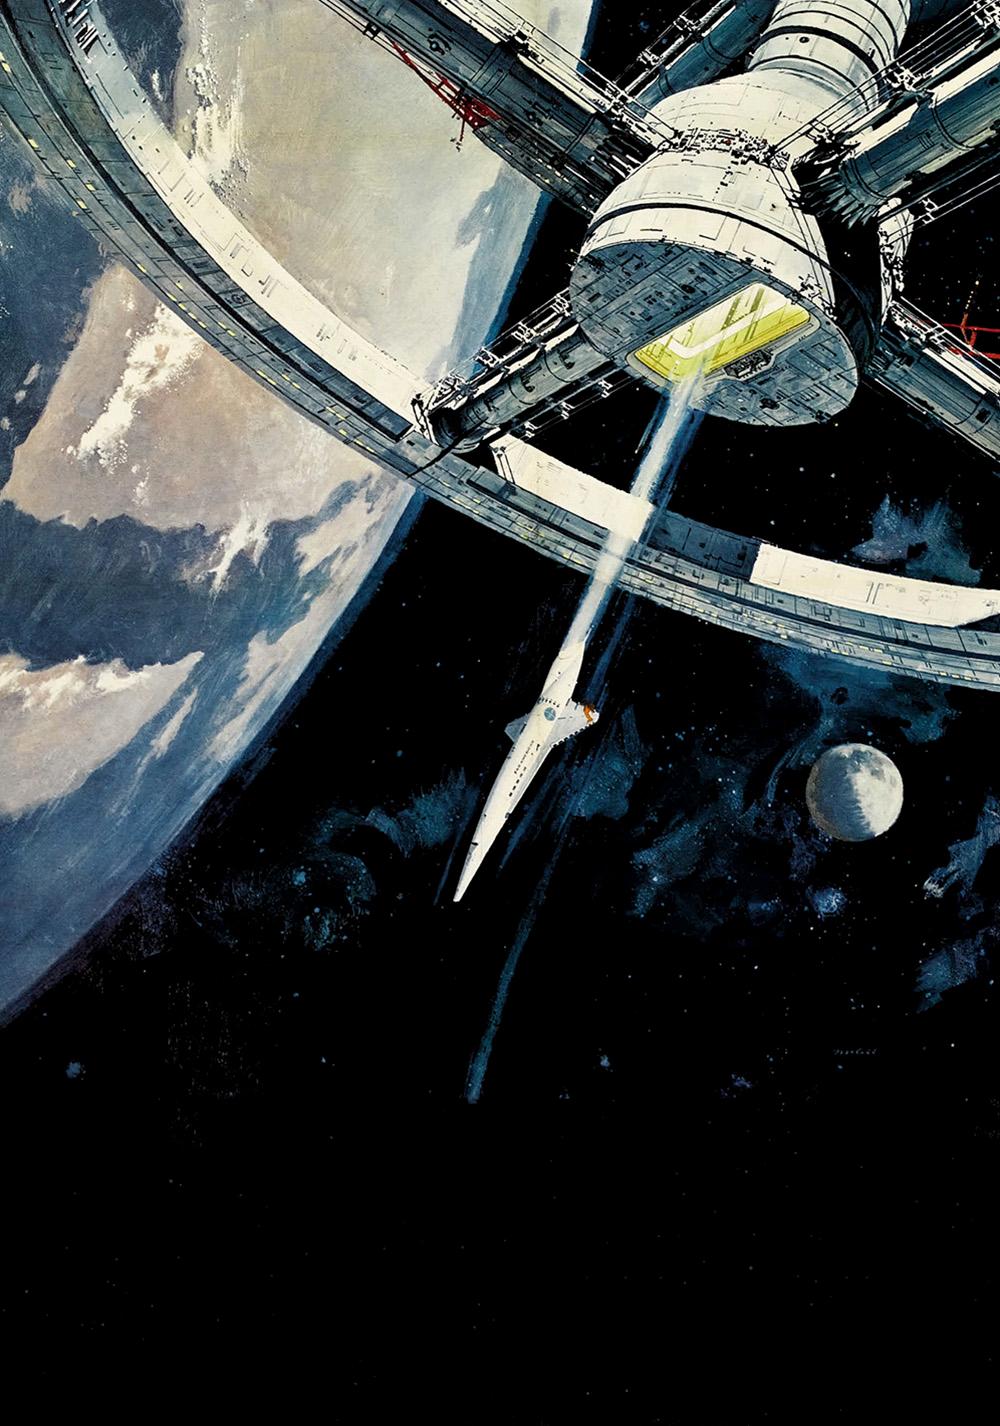 2001 a Space Odyssey Artwork